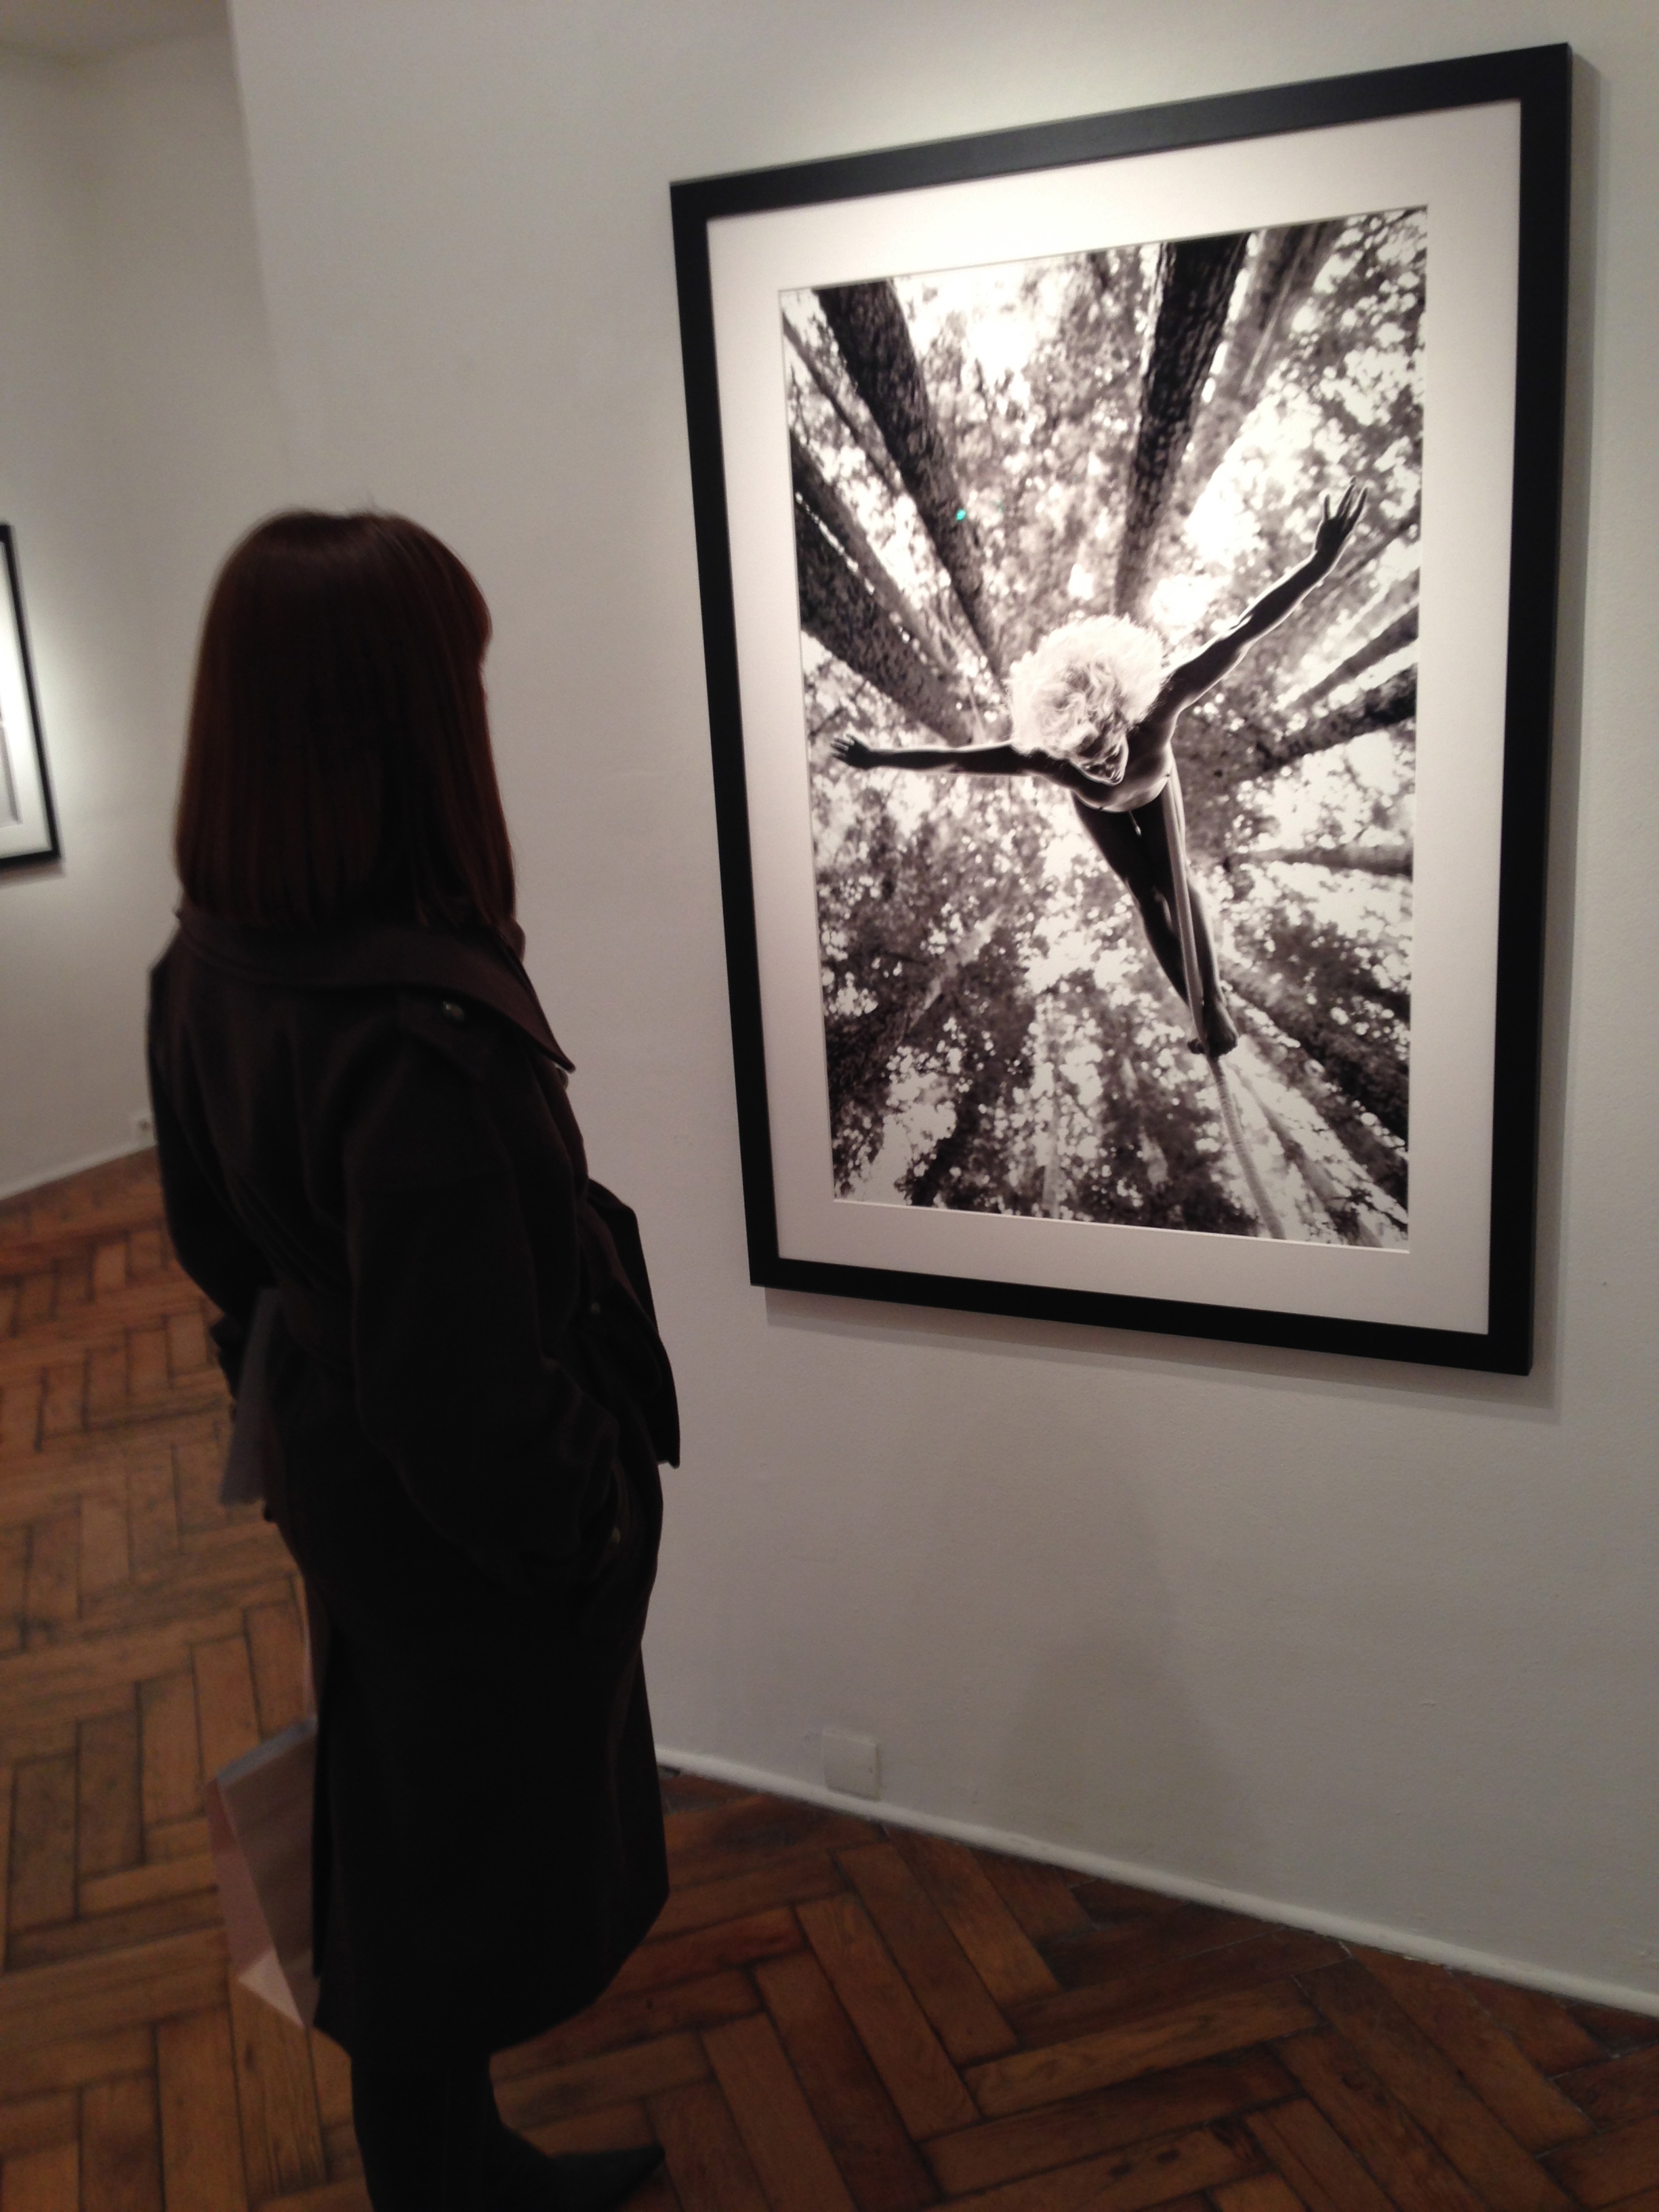 Acey Harper, 'No Limits 2' @ Galerie Hug, Paris 4.12.13